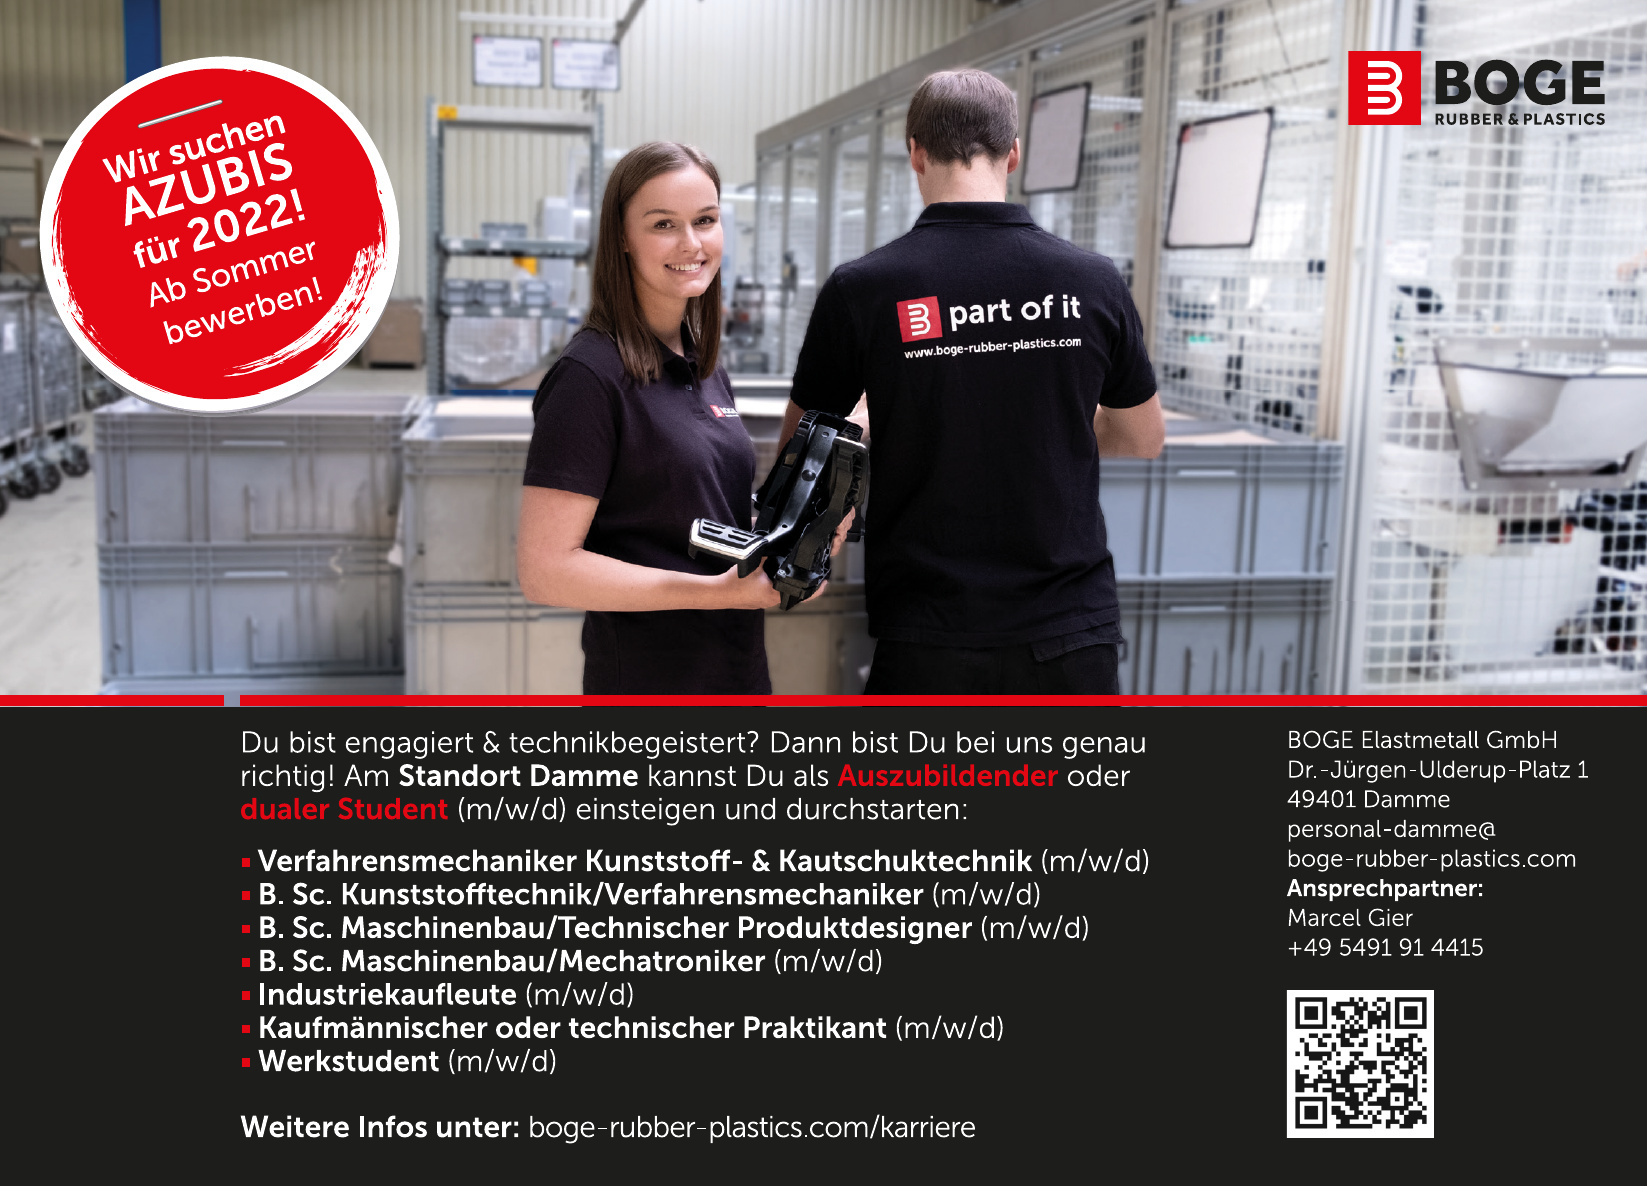 BOGE Elastmetall GmbH